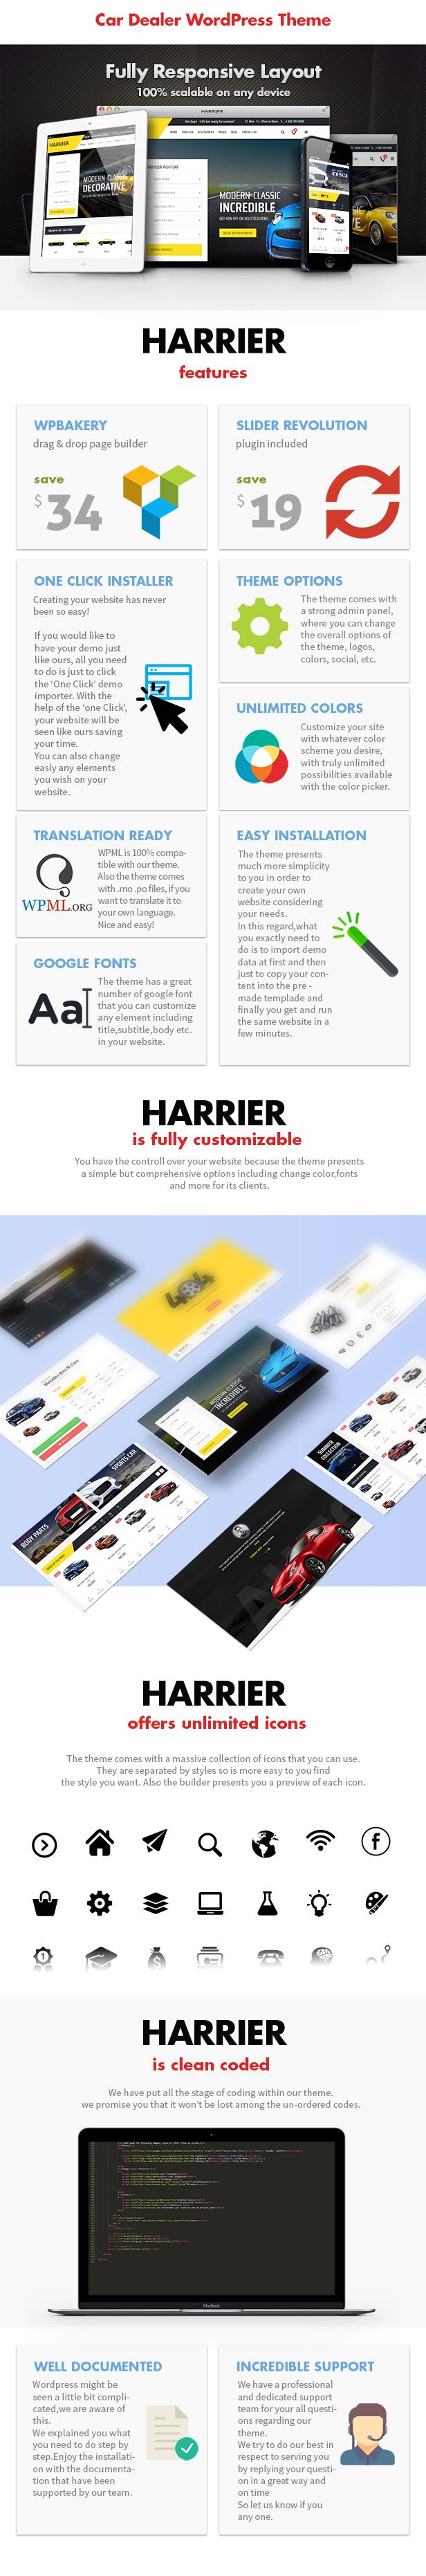 Harrier - Car Dealer and Automotive WordPress Theme - 3